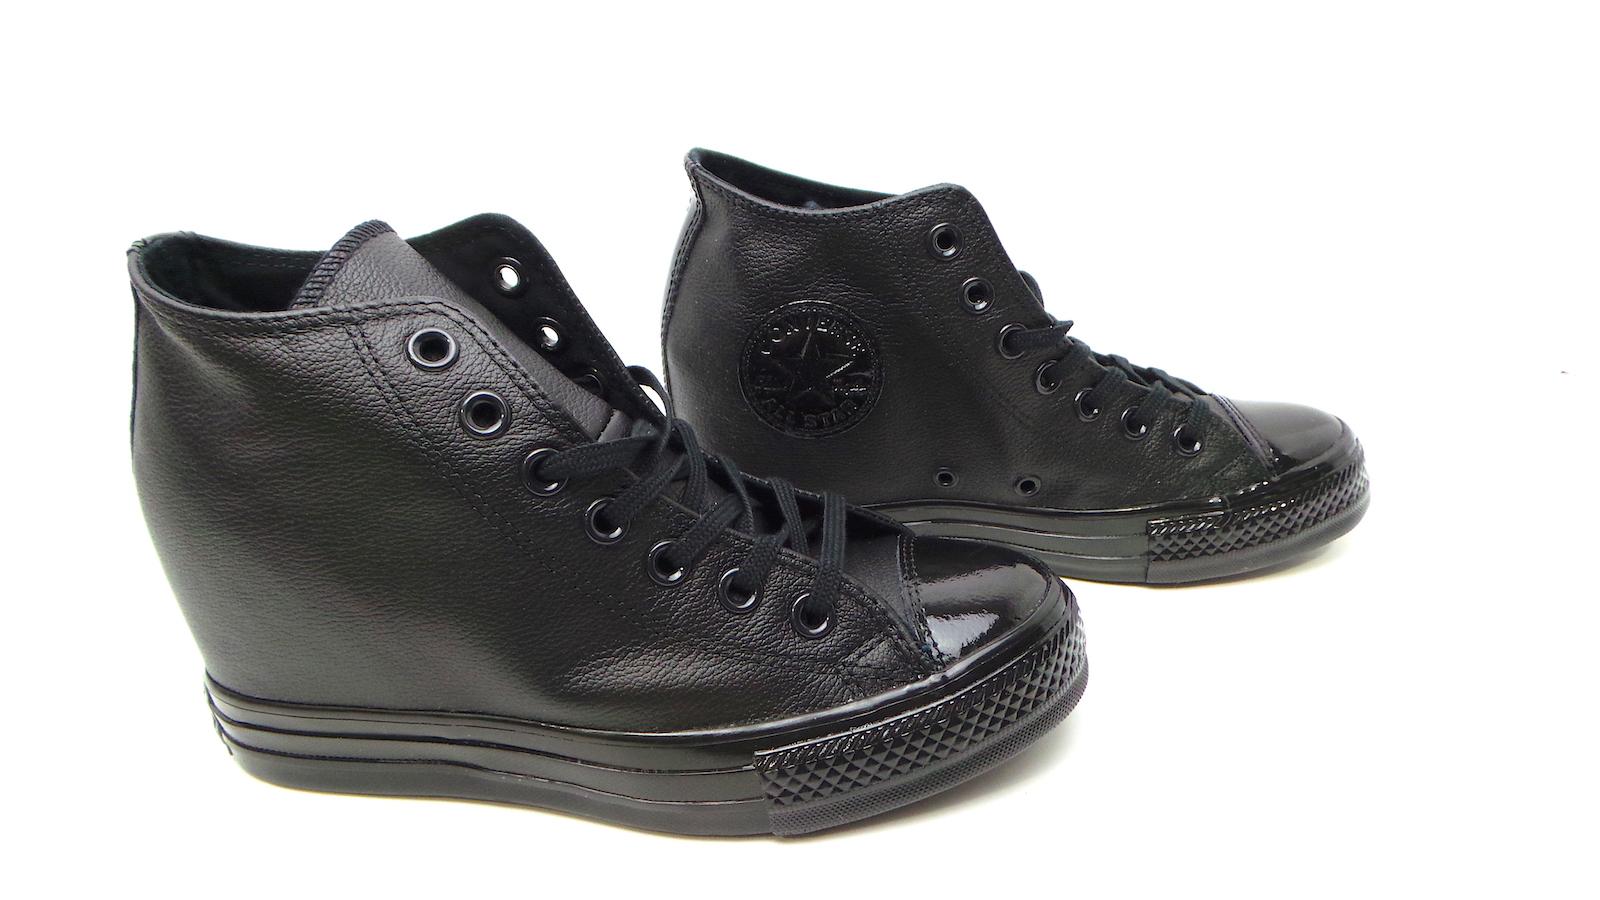 sportive Converse Converse Categoria Delpopoloshop scarpe 3 AjL54R